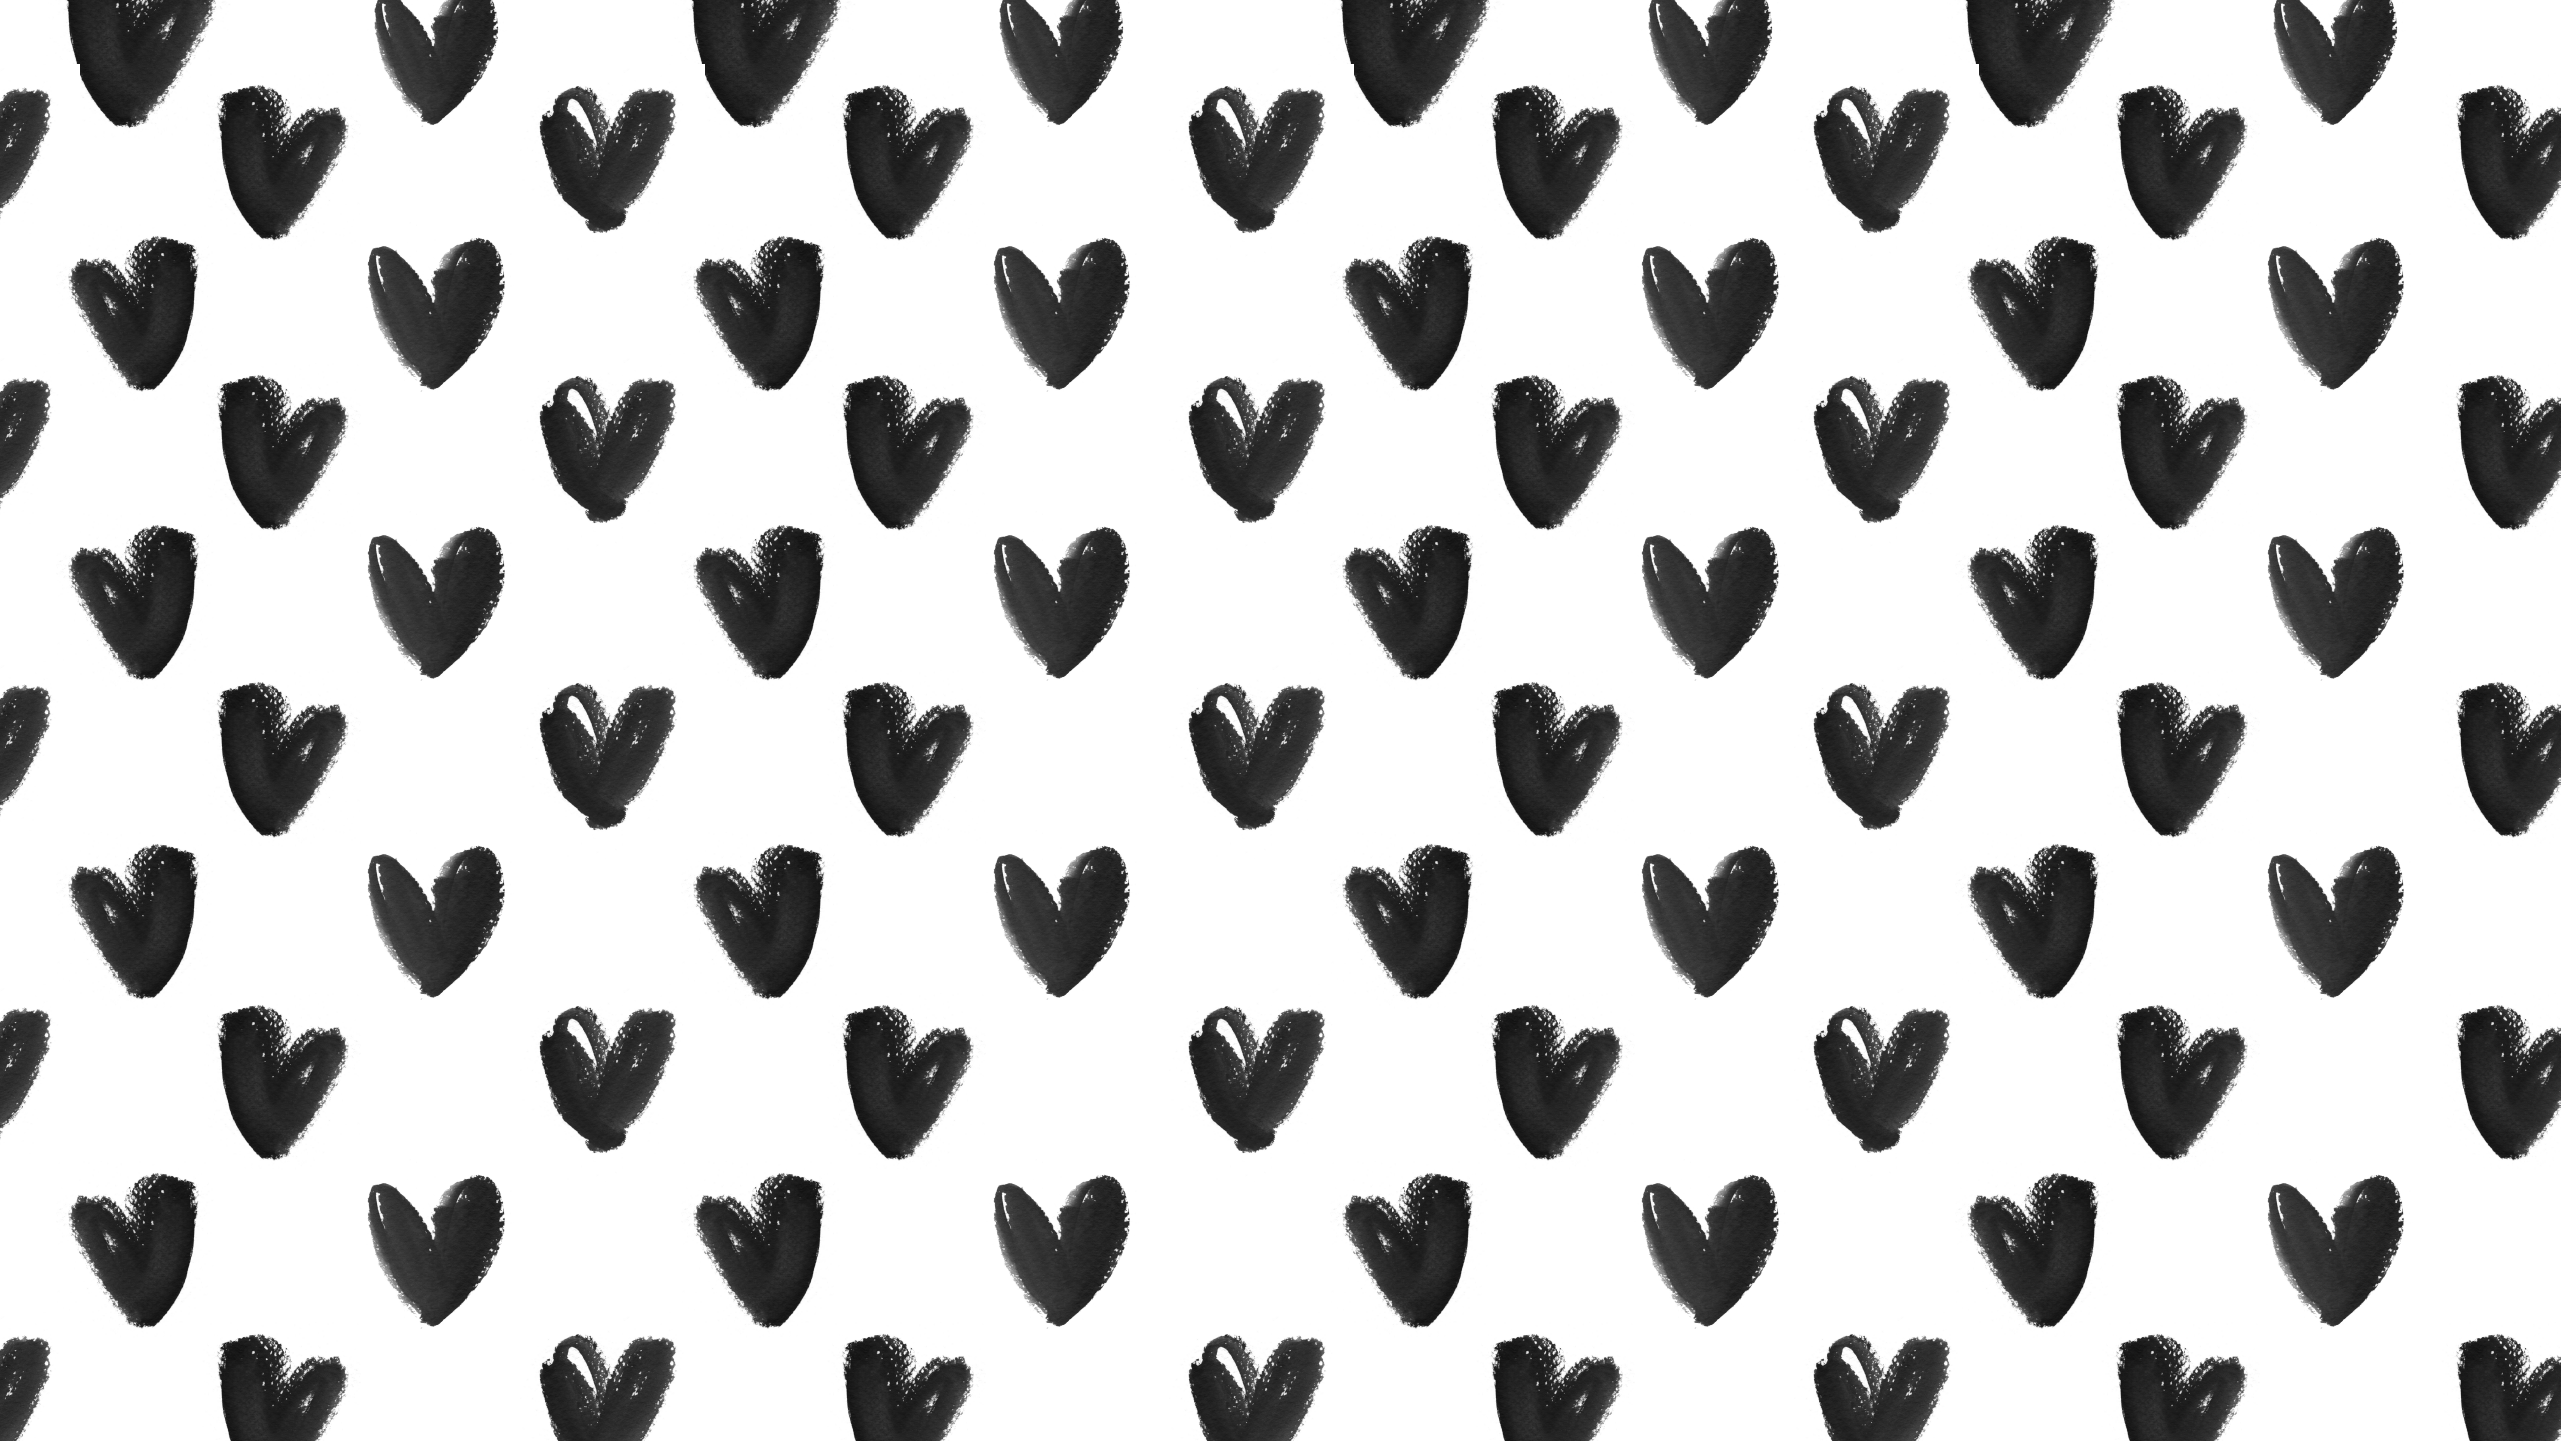 February Wallpaper Nicolesclasses 08 Png 2561 1441 February Wallpaper Computer Wallpaper Desktop Wallpapers Cute Desktop Wallpaper